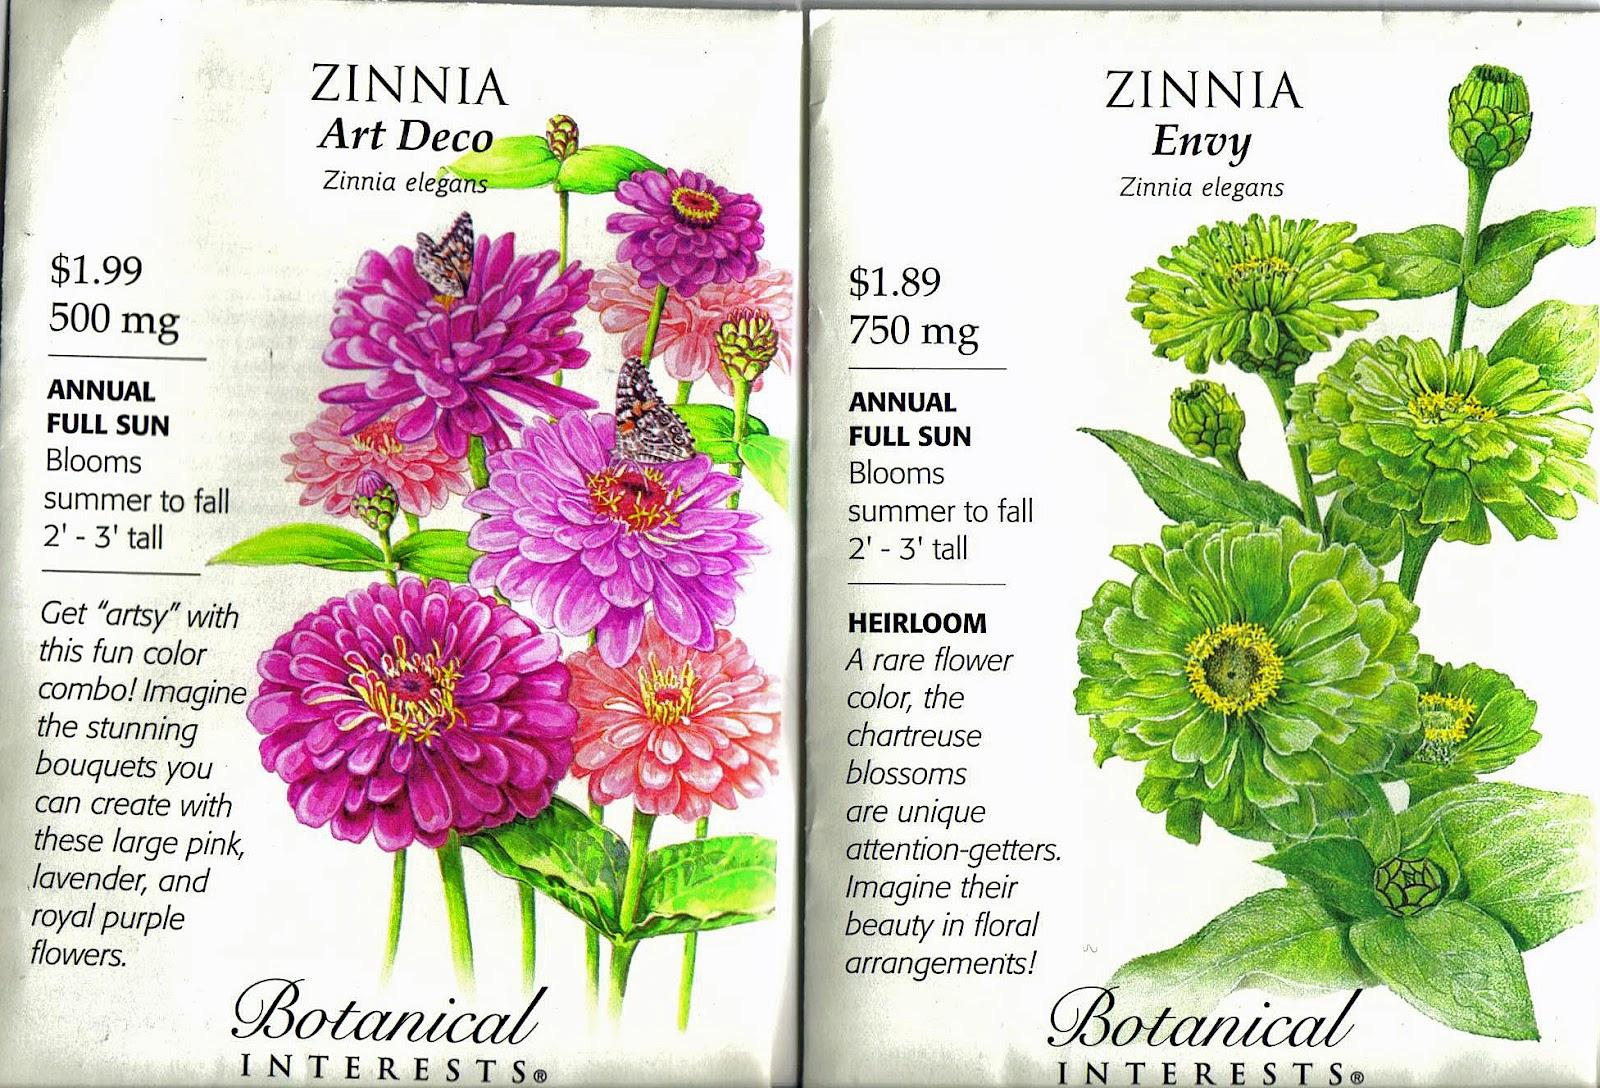 Deborah Jeans Dandelion House And Garden Cut Flower Focus Zinnia